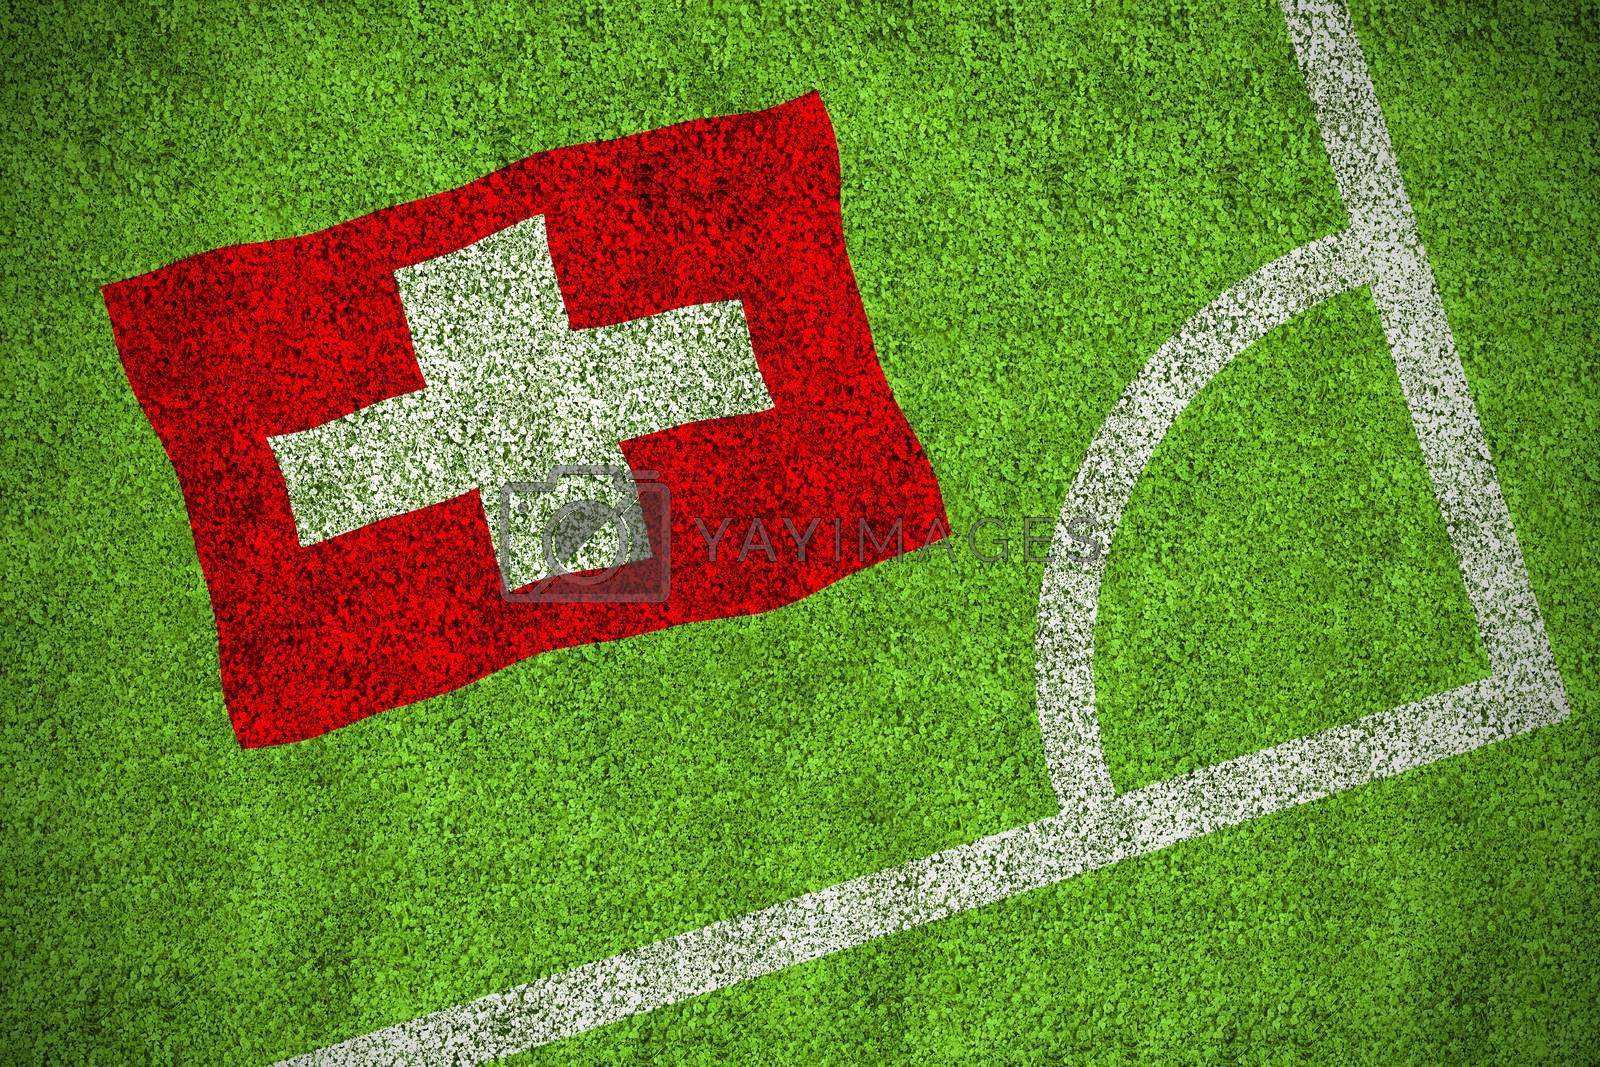 Switzerland national flag by Wavebreakmedia